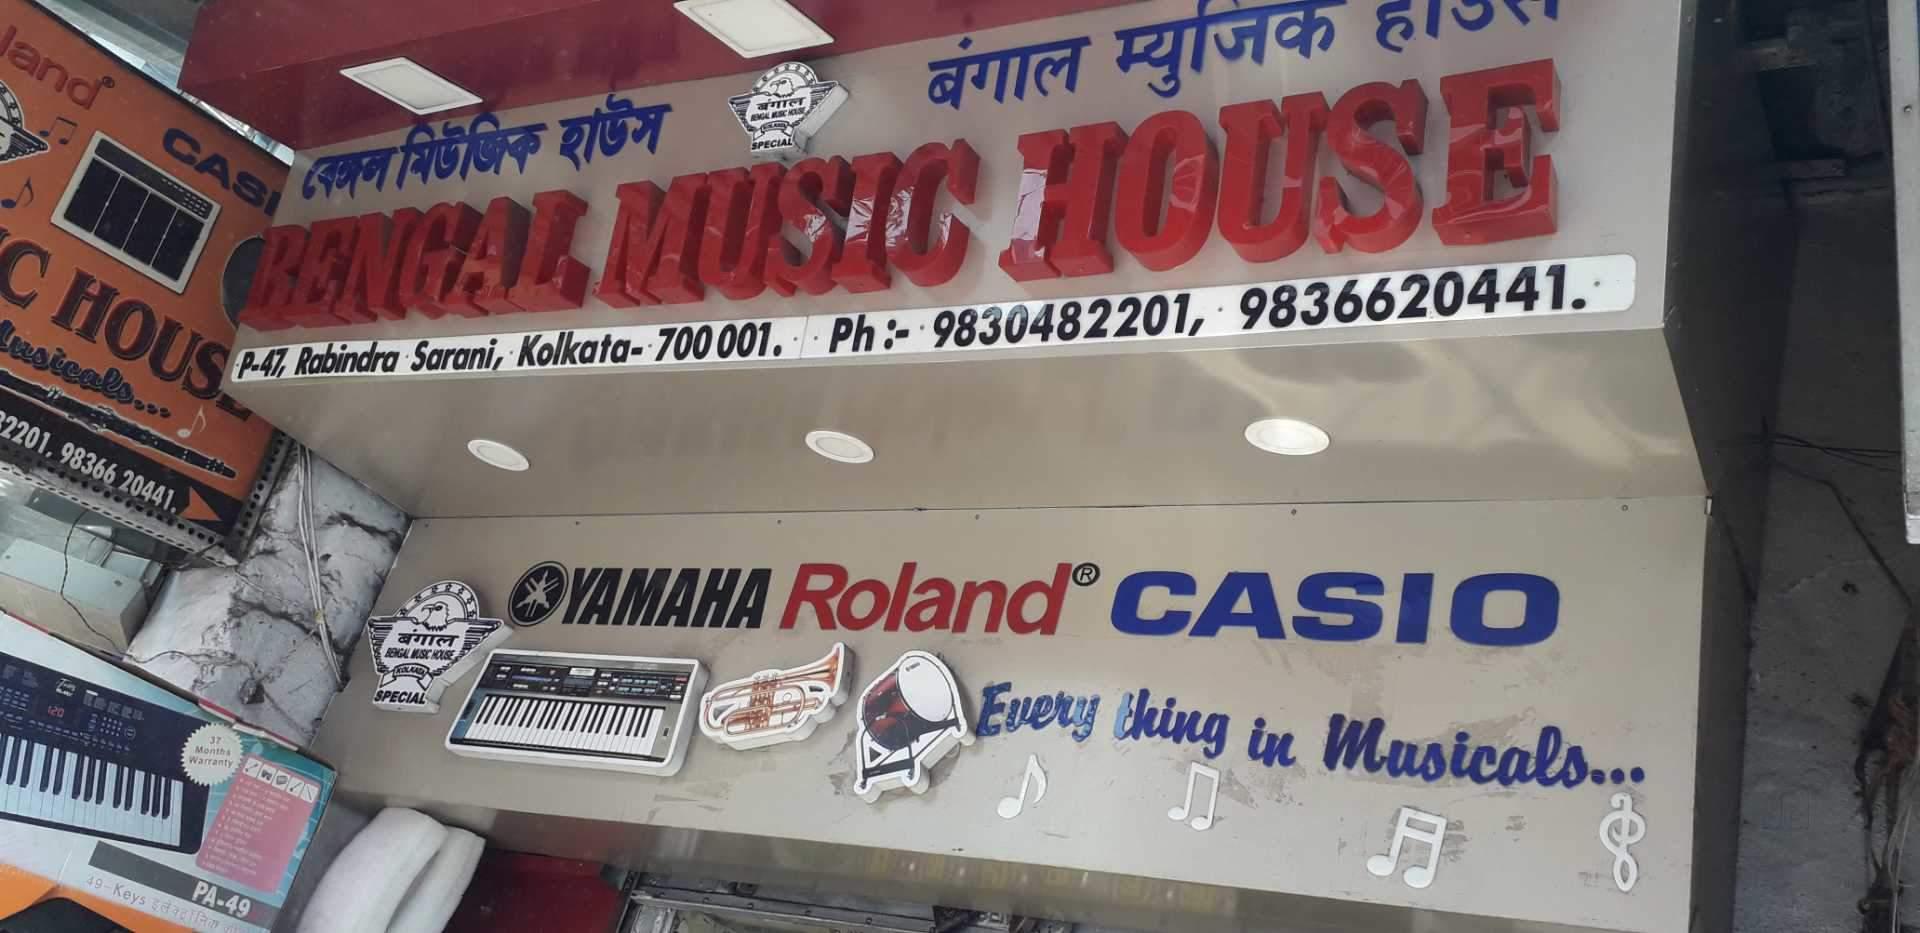 Top 50 Roland Musical Instrument Dealers in Kolkata - Best